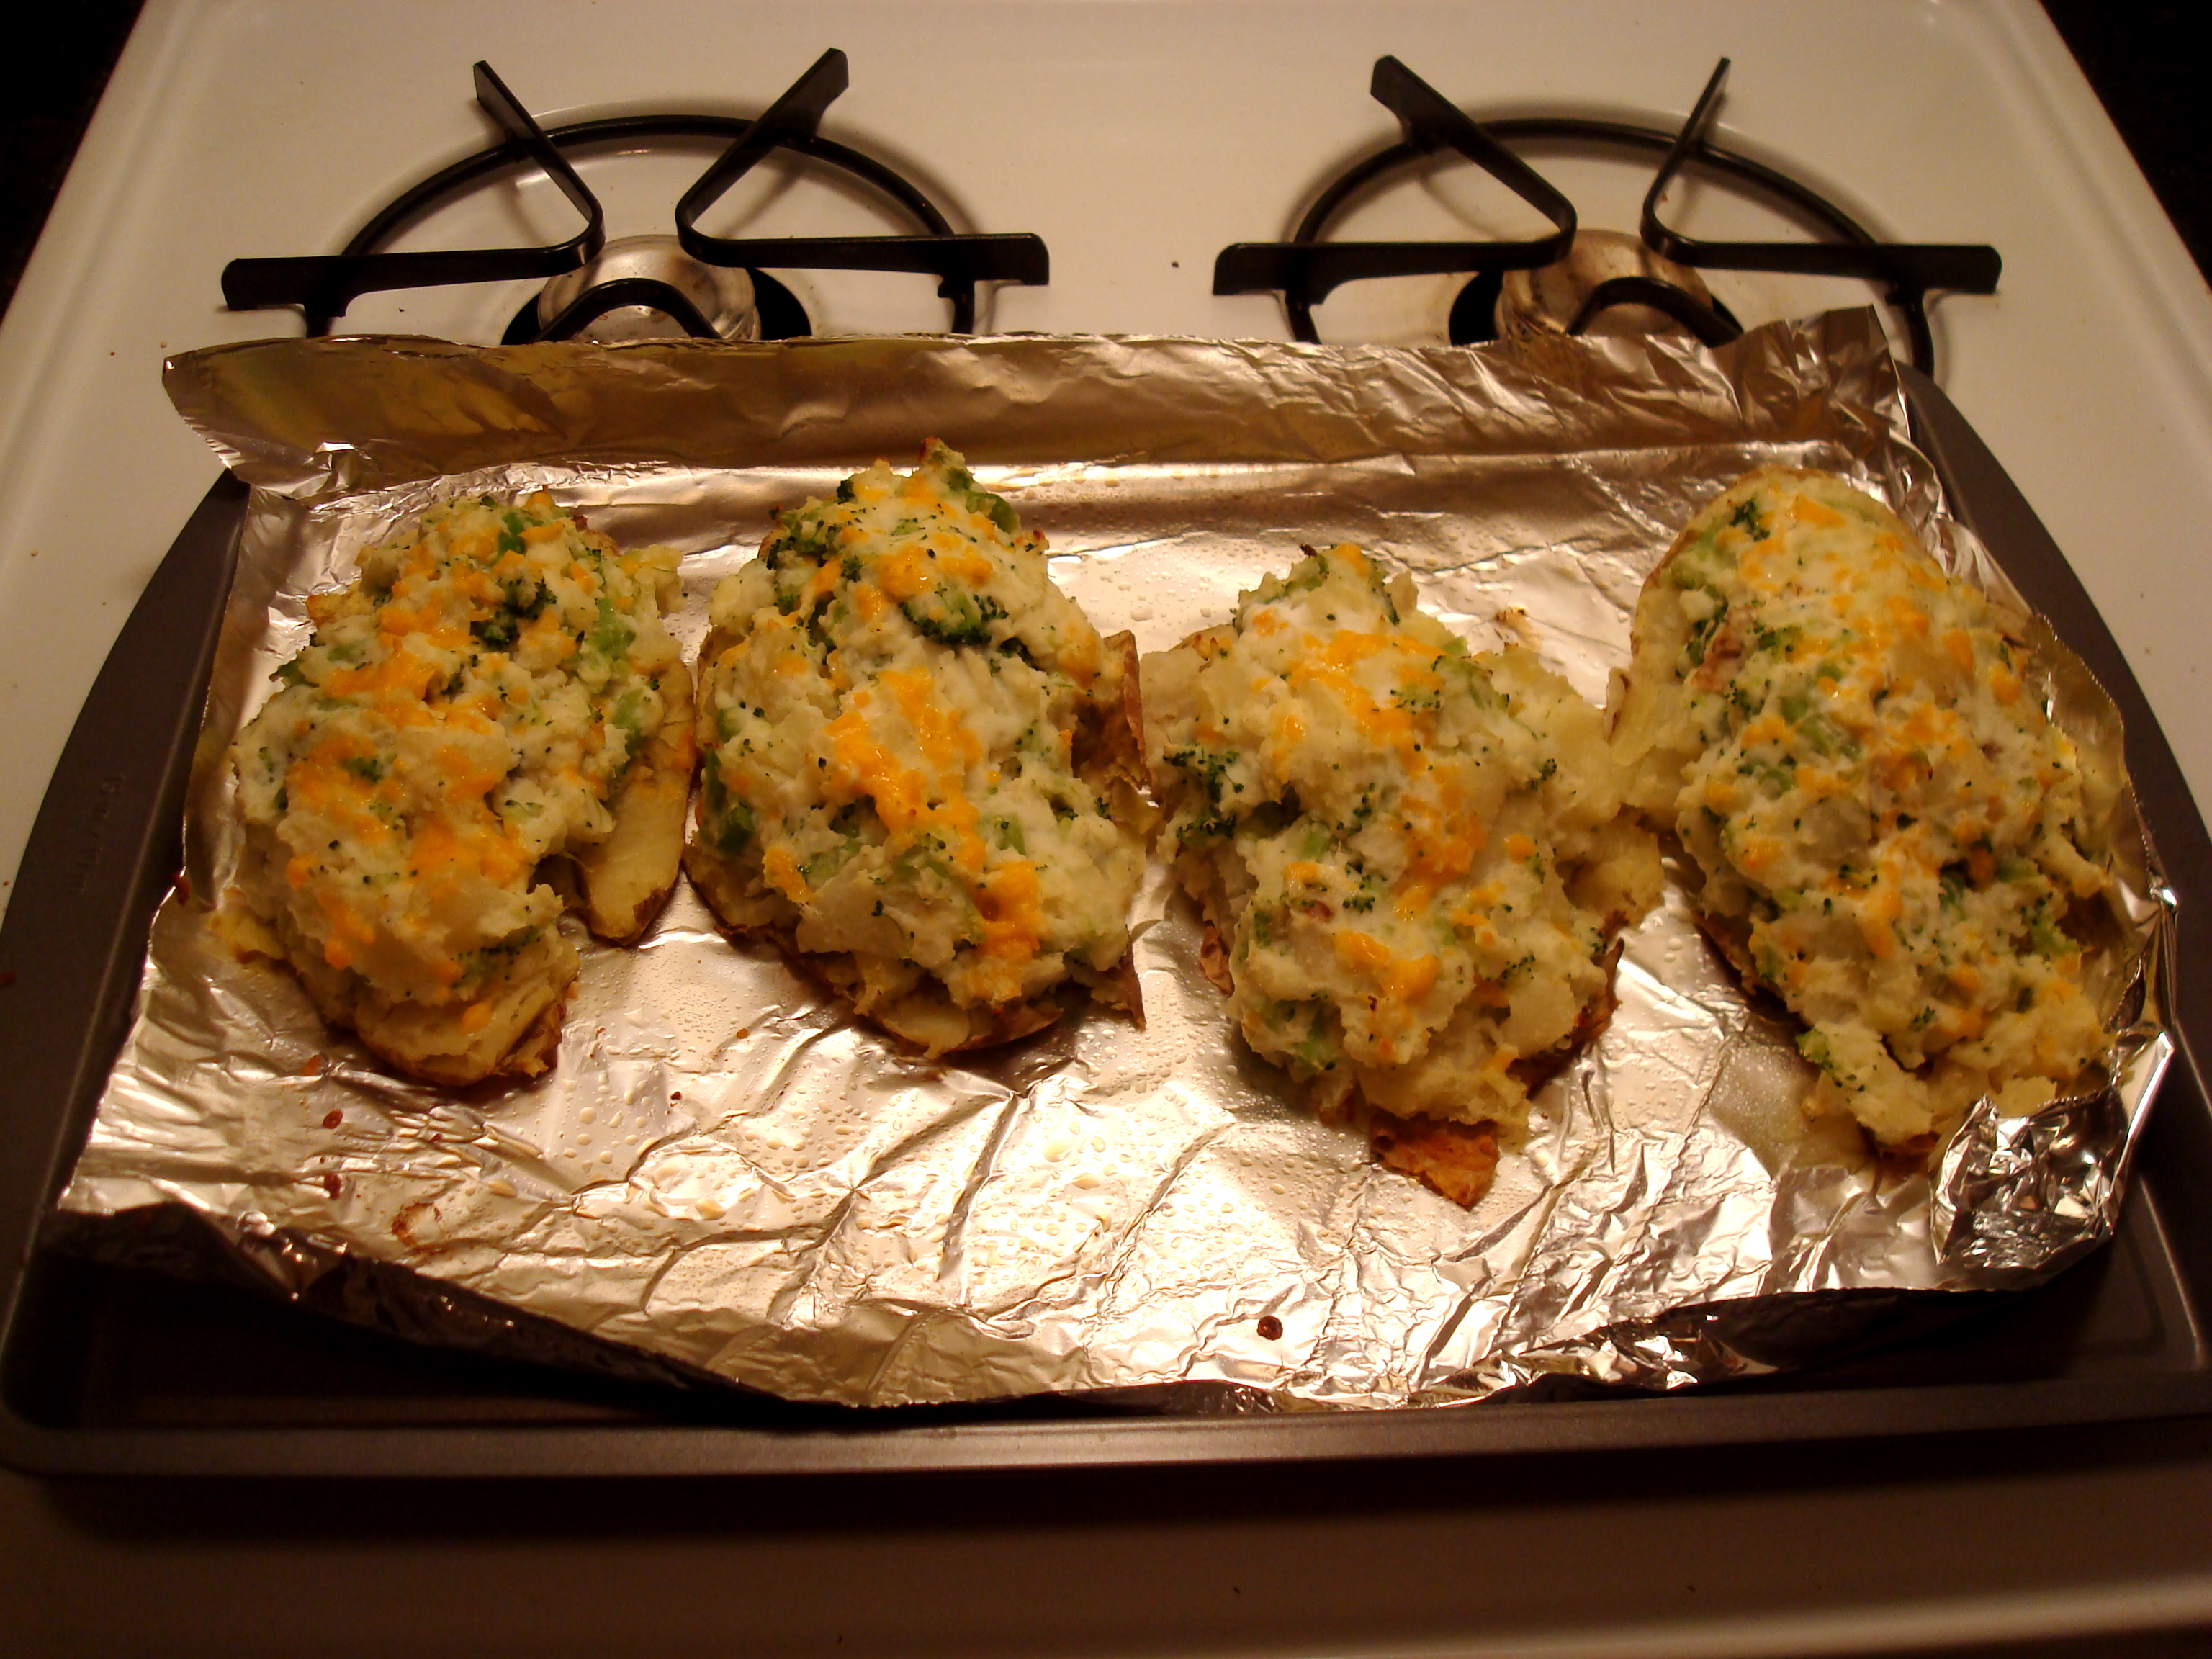 Broccoli Cheddar Twice Baked Potatoes, made with Greek Yogurt